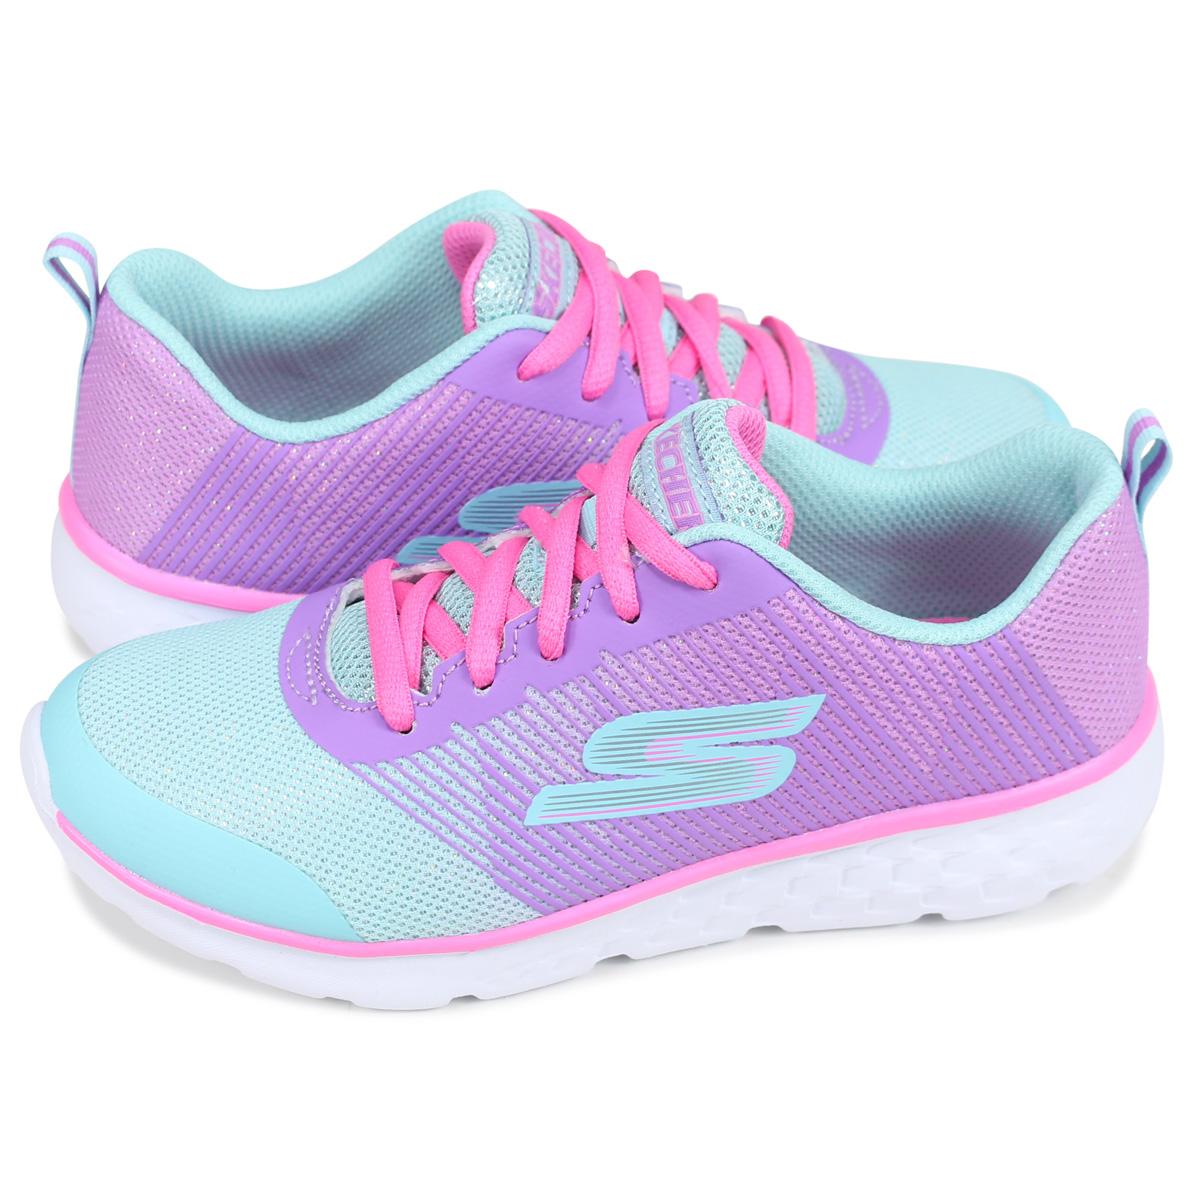 81353 go run 400 | scarlett | Navy pink, Skechers, Running